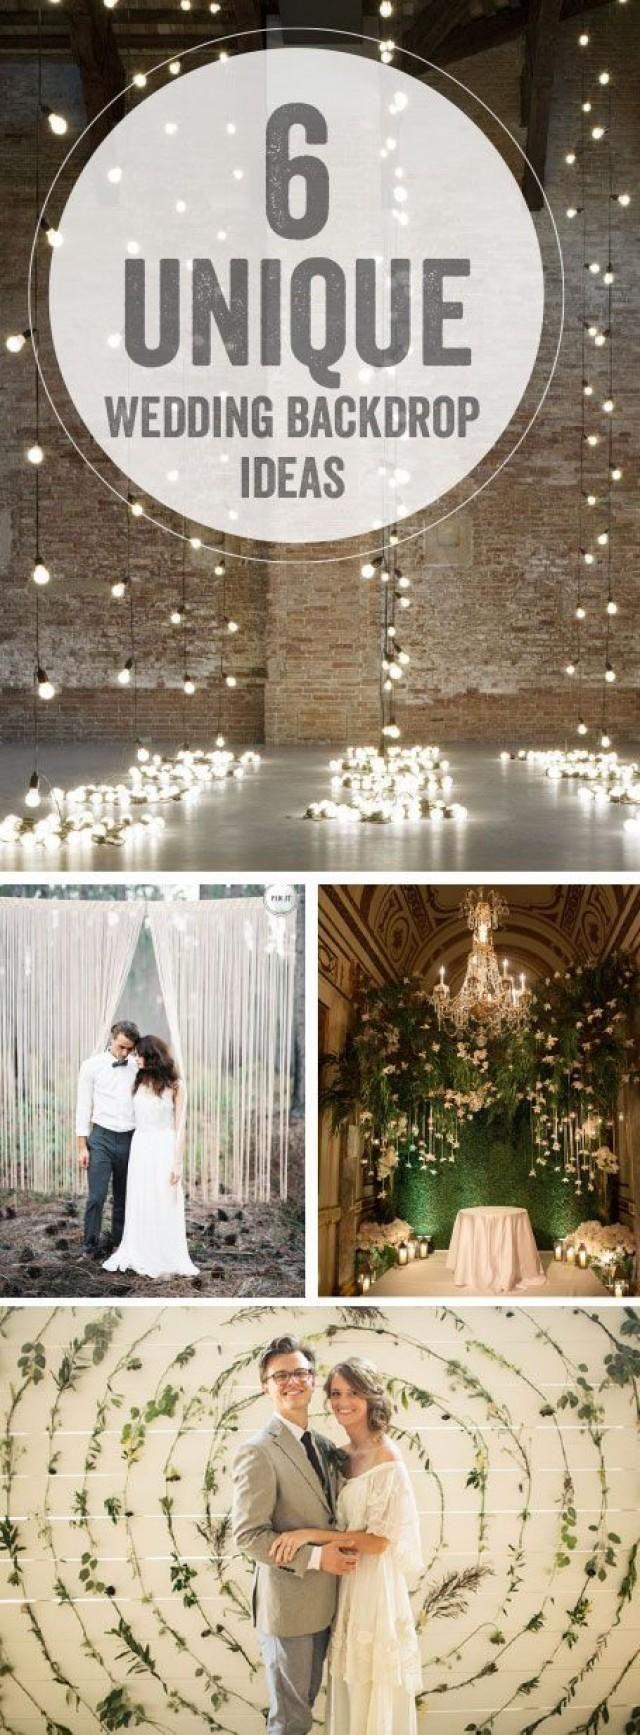 6 Unique Wedding Backdrop Ideas Events planning & Party Pinterest Wedding Unique weddings